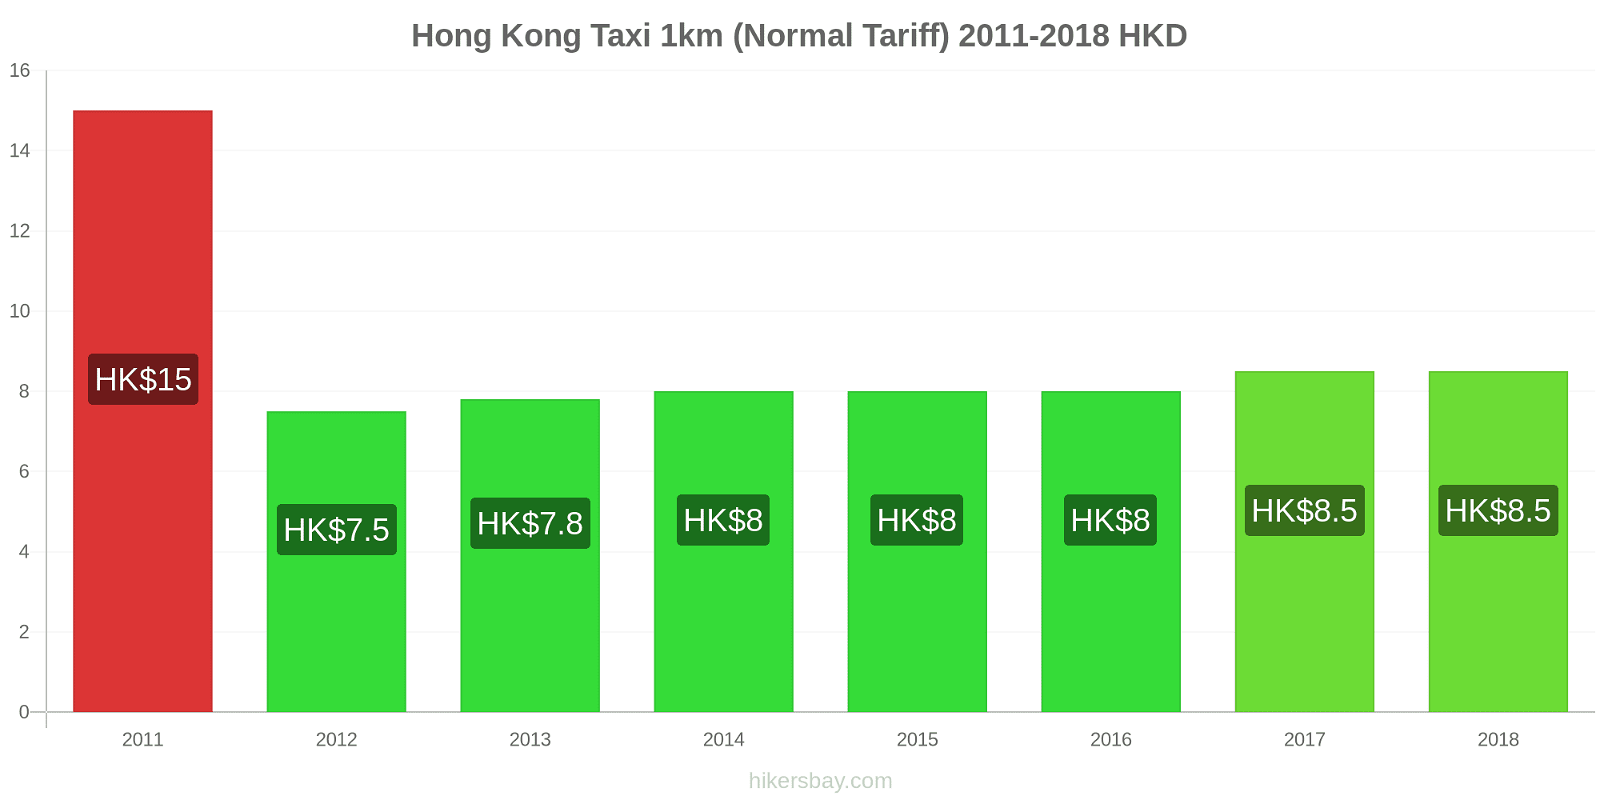 Hong Kong price changes Taxi 1km (Normal Tariff) hikersbay.com